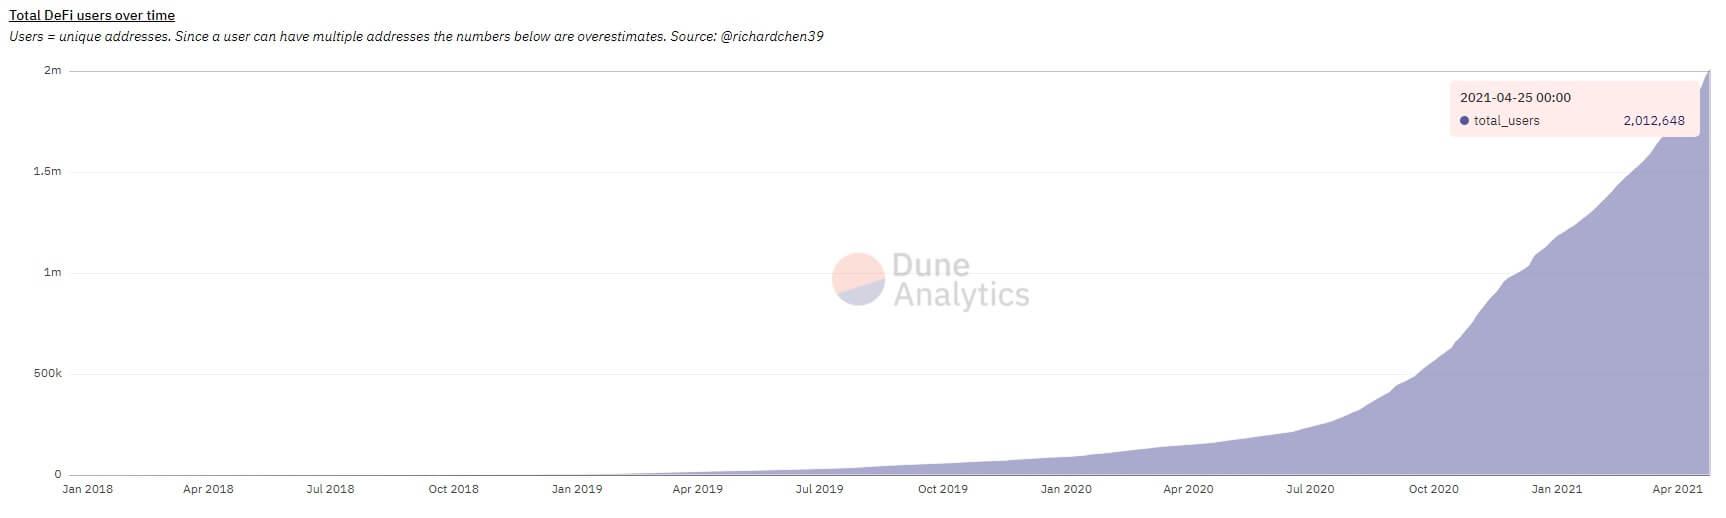 The DeFi ecosystem exceeds 2 million unique addresses